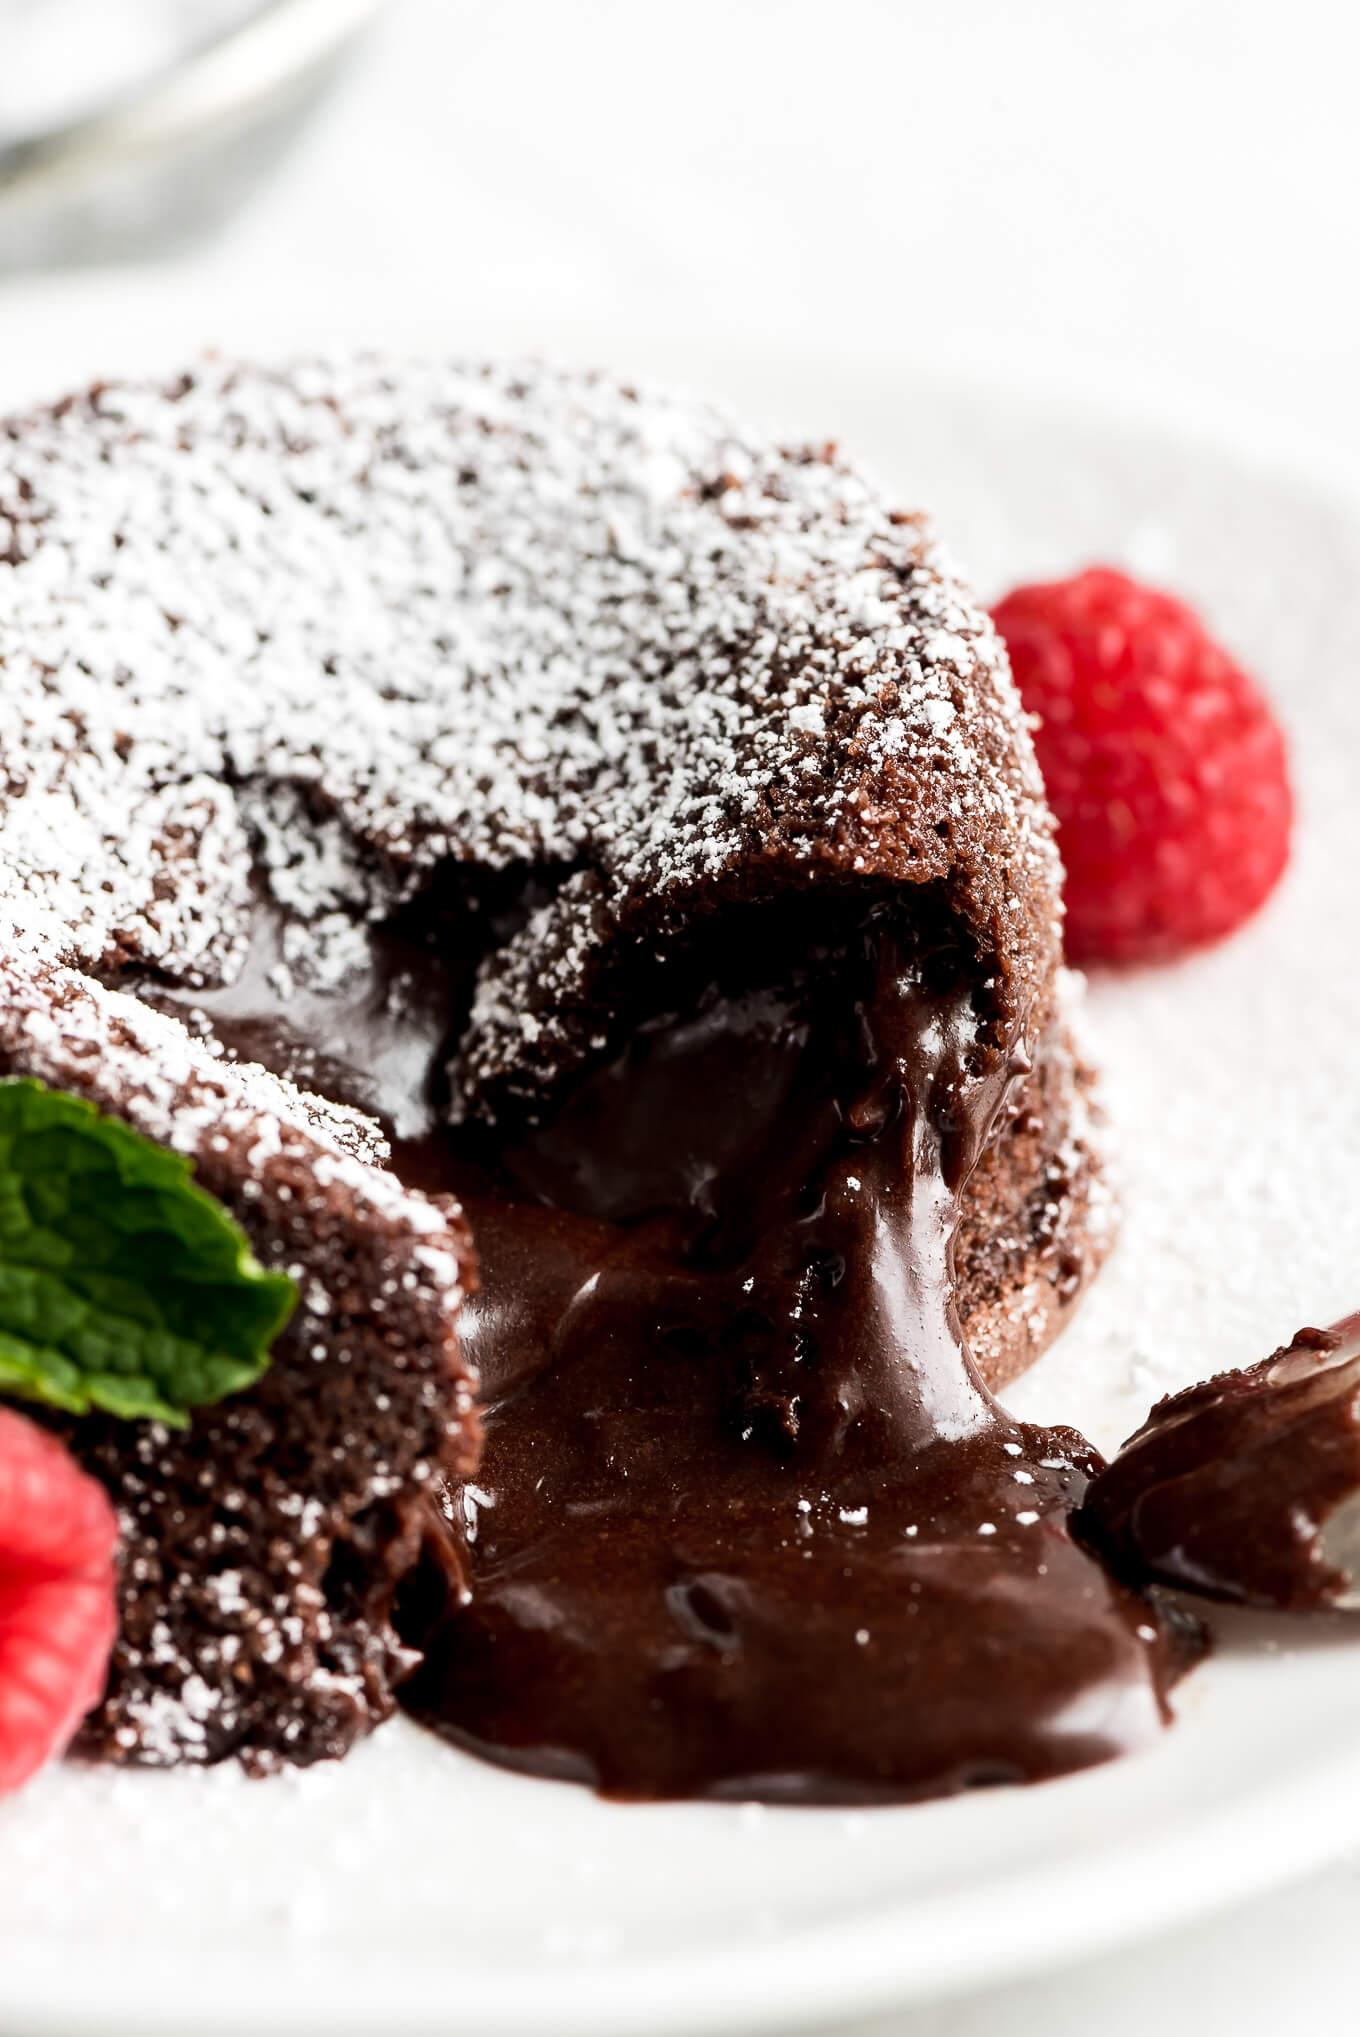 A closeup shot of the gooey chocolate center of a molten lava cake.